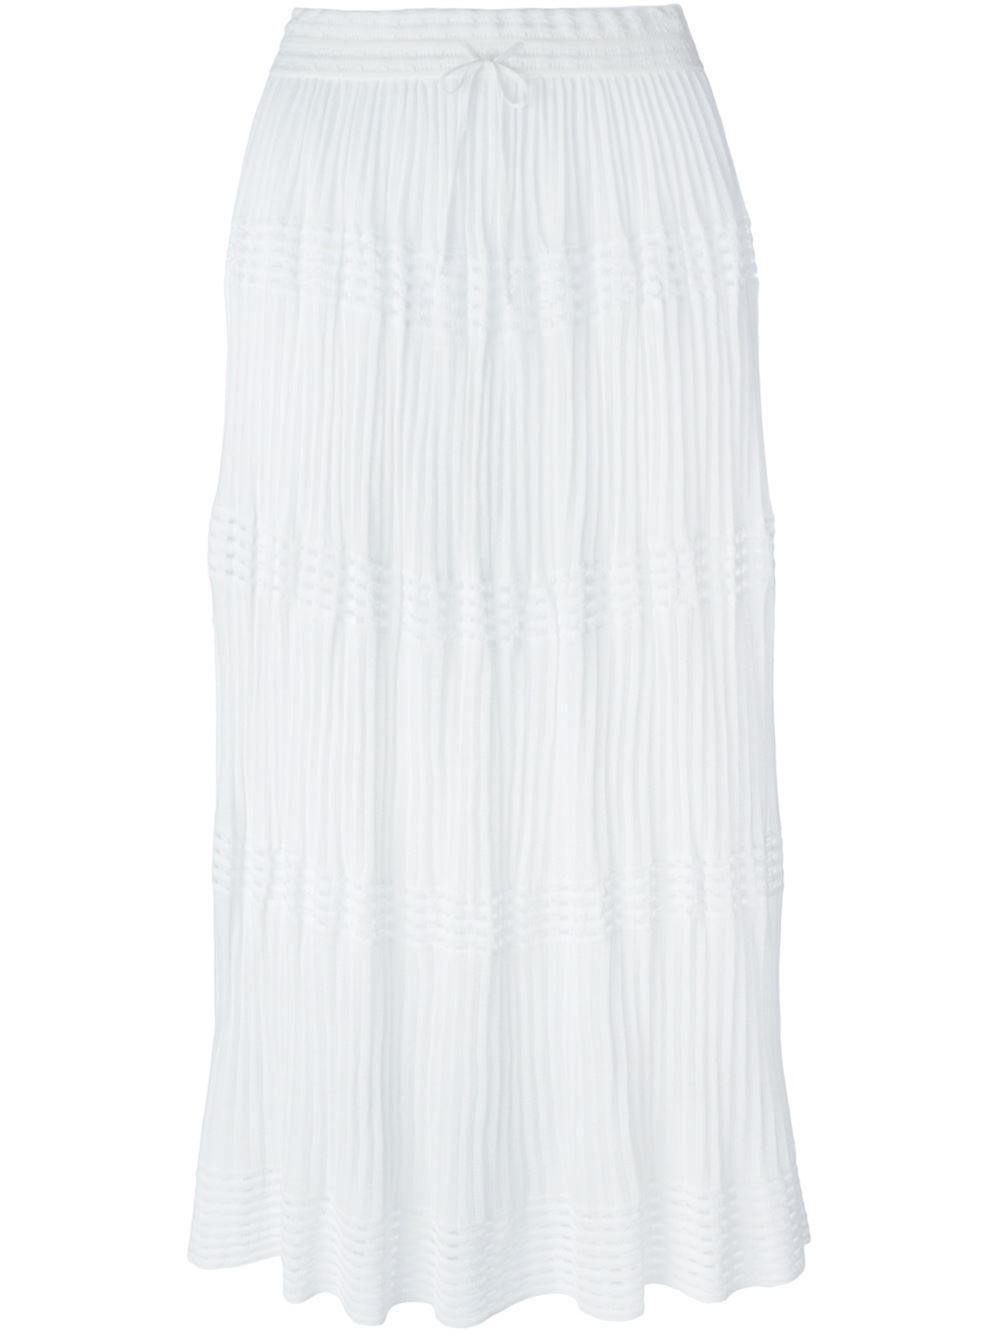 m missoni knit maxi skirt in white lyst